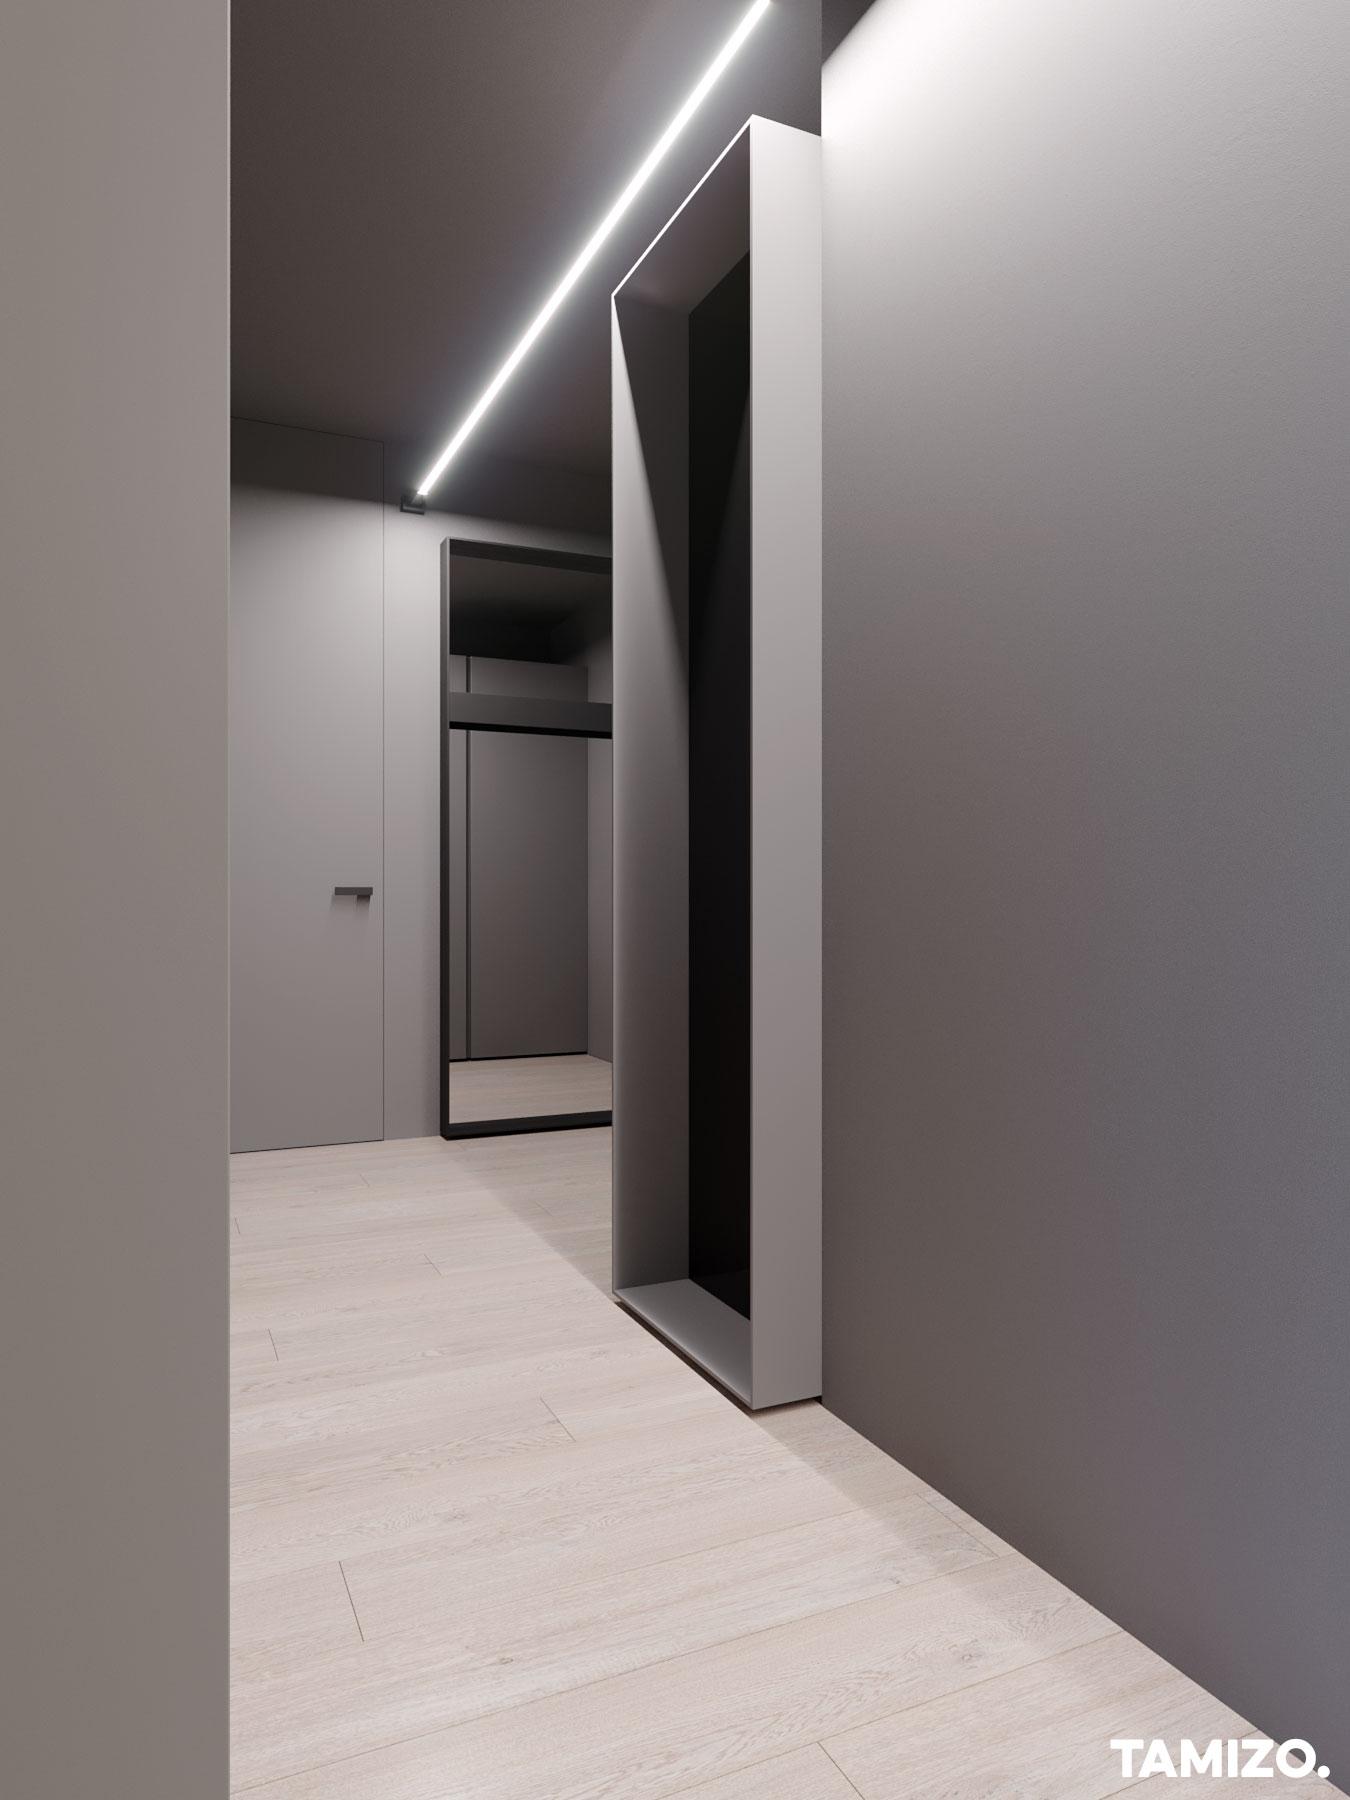 tamizo_interior_wnetrza_projekt_architekci_mateusz_kuo_stolarski_lodz_07